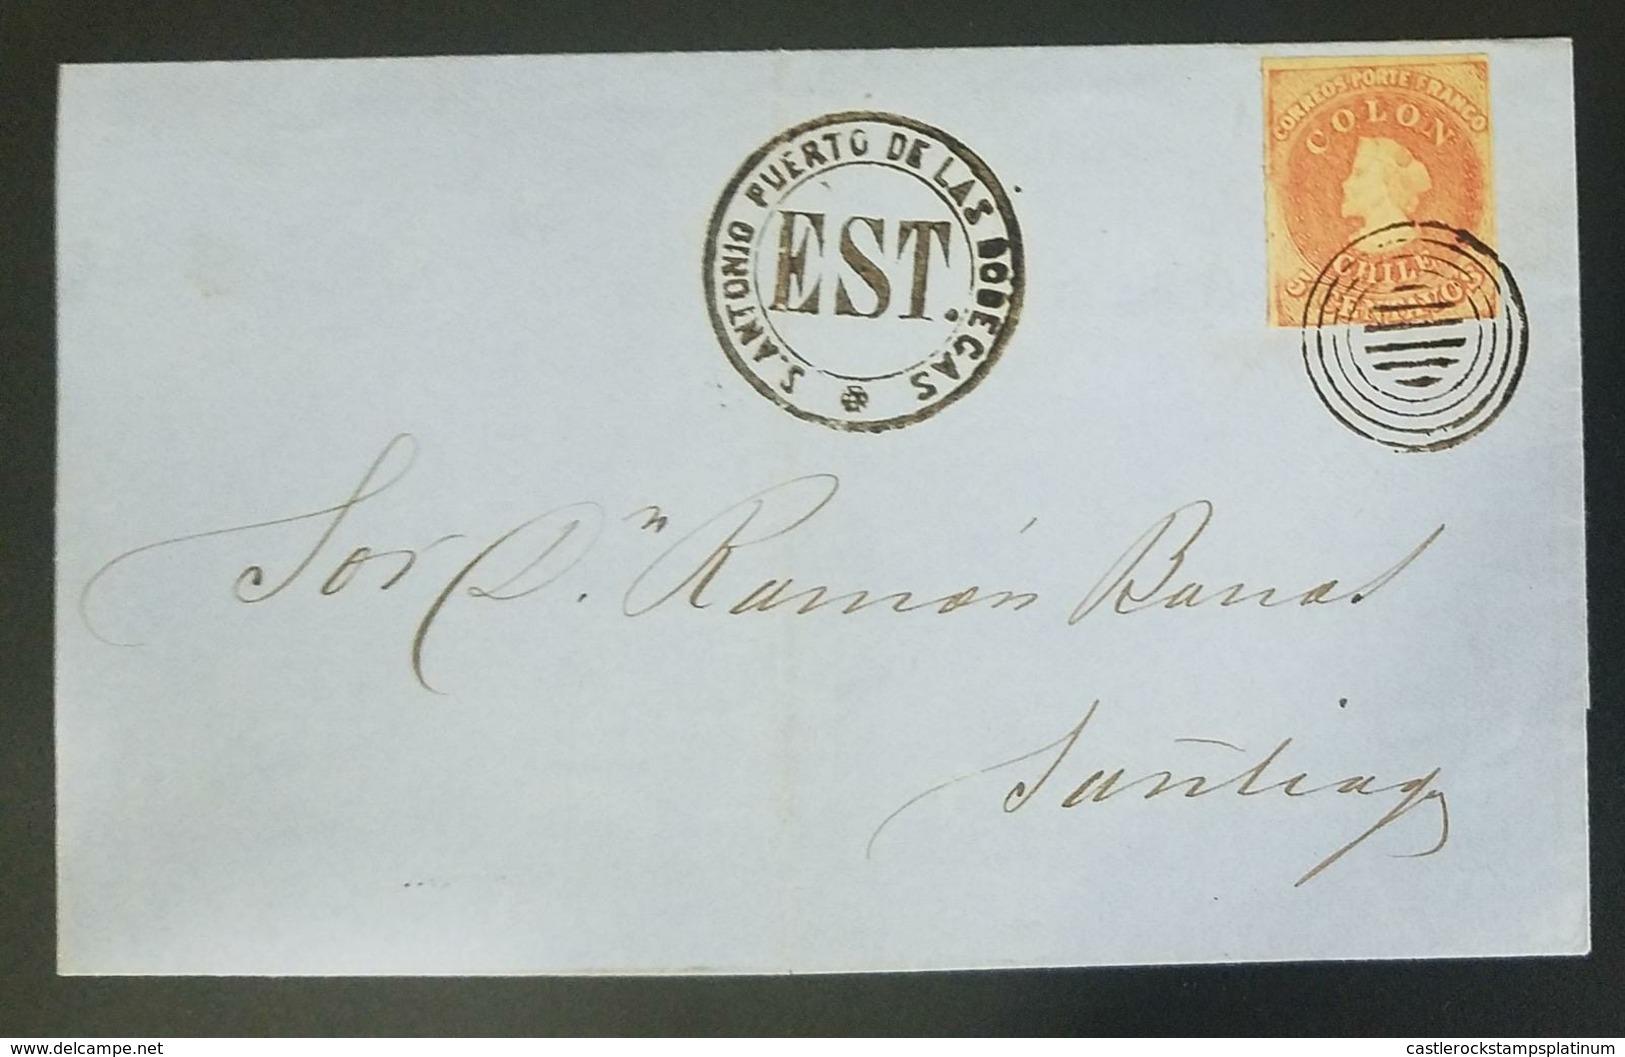 O) 1864 CHILE, ESTAFETA-EST -CHRISTOPHER COLUMBUS 5c-LONDON PRINTS- SAN ANTONIO PUERTO DE LAS BODEGAS-TO SANTIAGO, PERFE - Chile